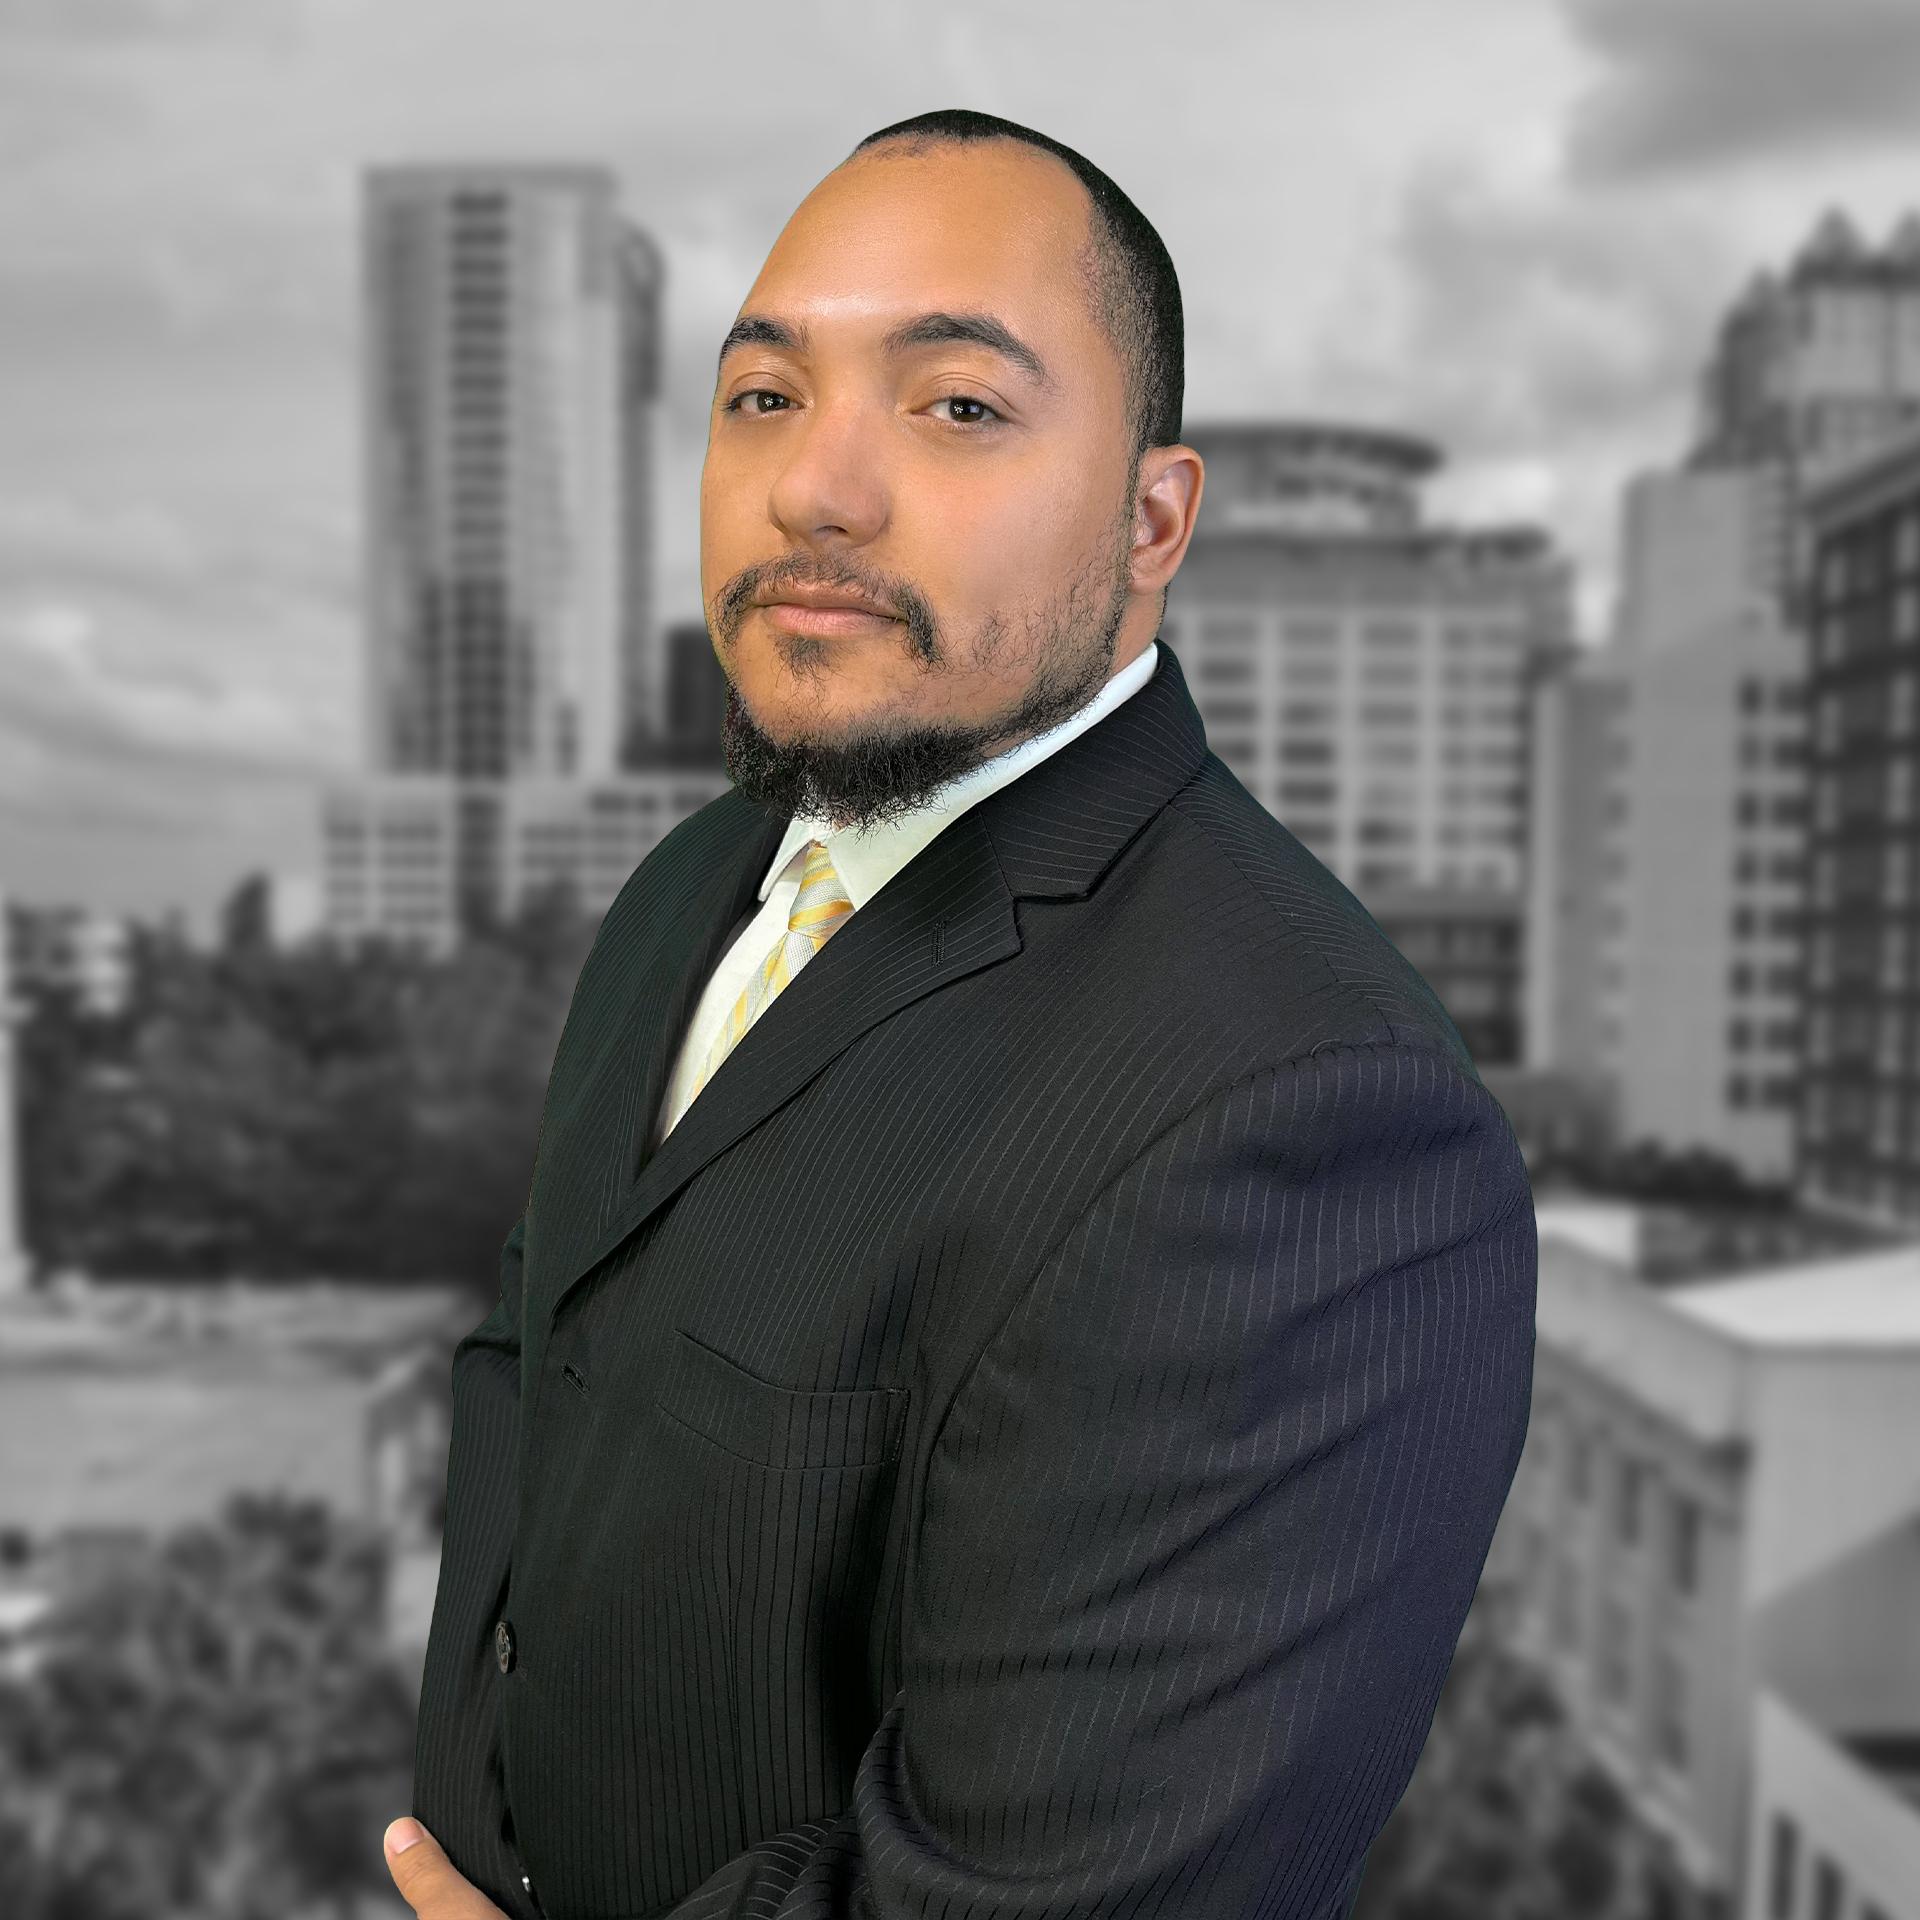 Settlement for $22,000 Less than Plaintiff Was Seeking